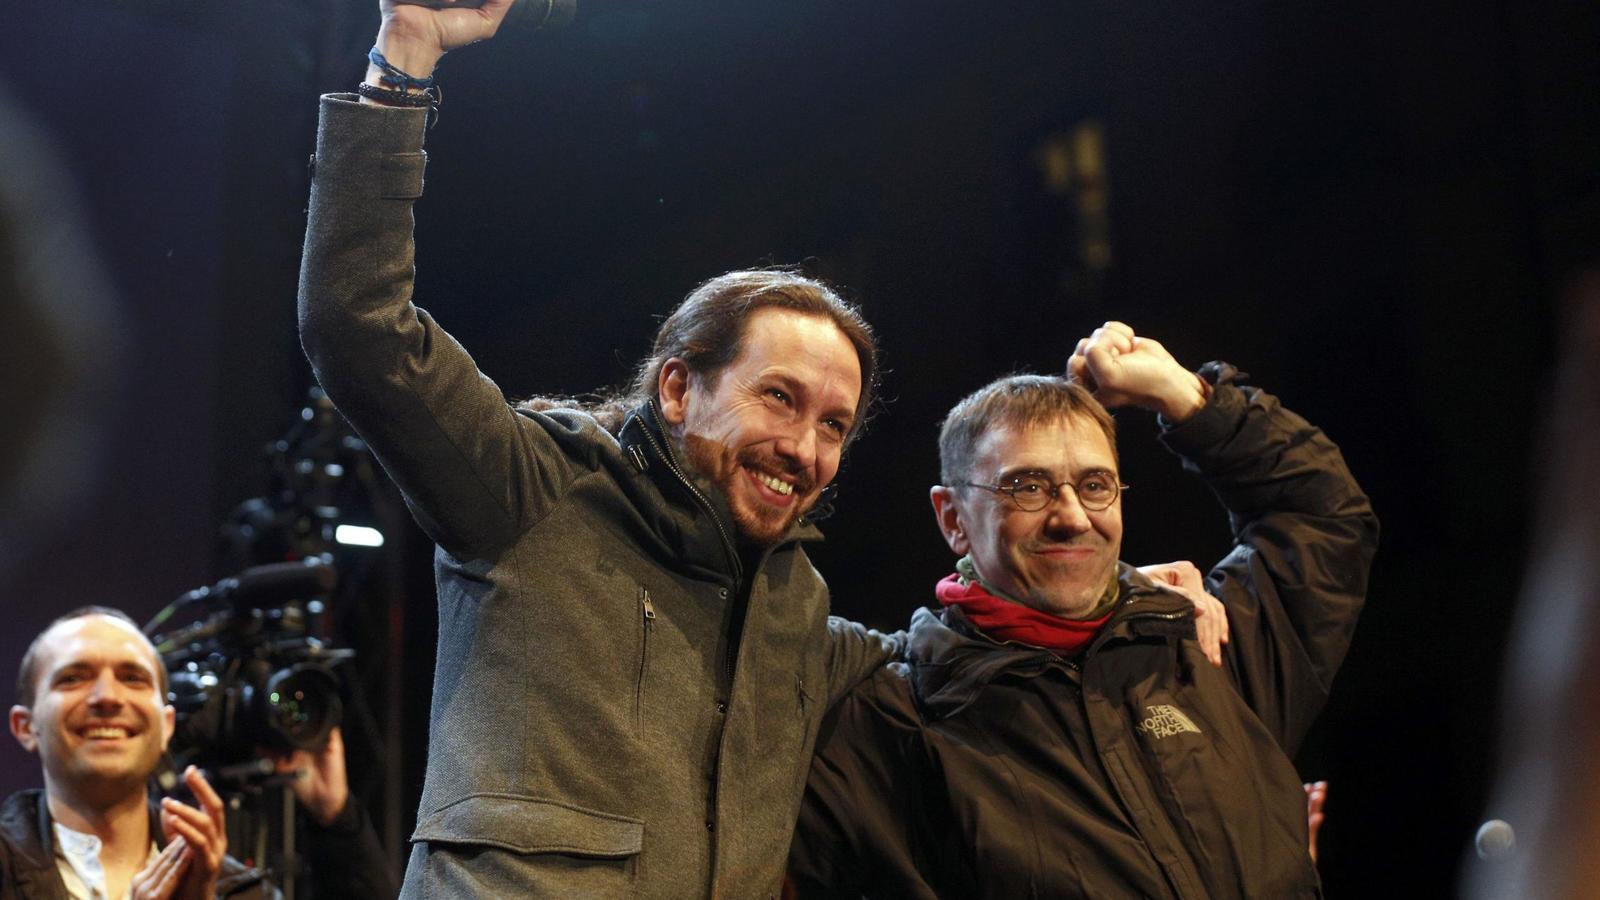 Neurona, la consultora chavista de Podemos, desvió miles de euros a una empresa fantasma